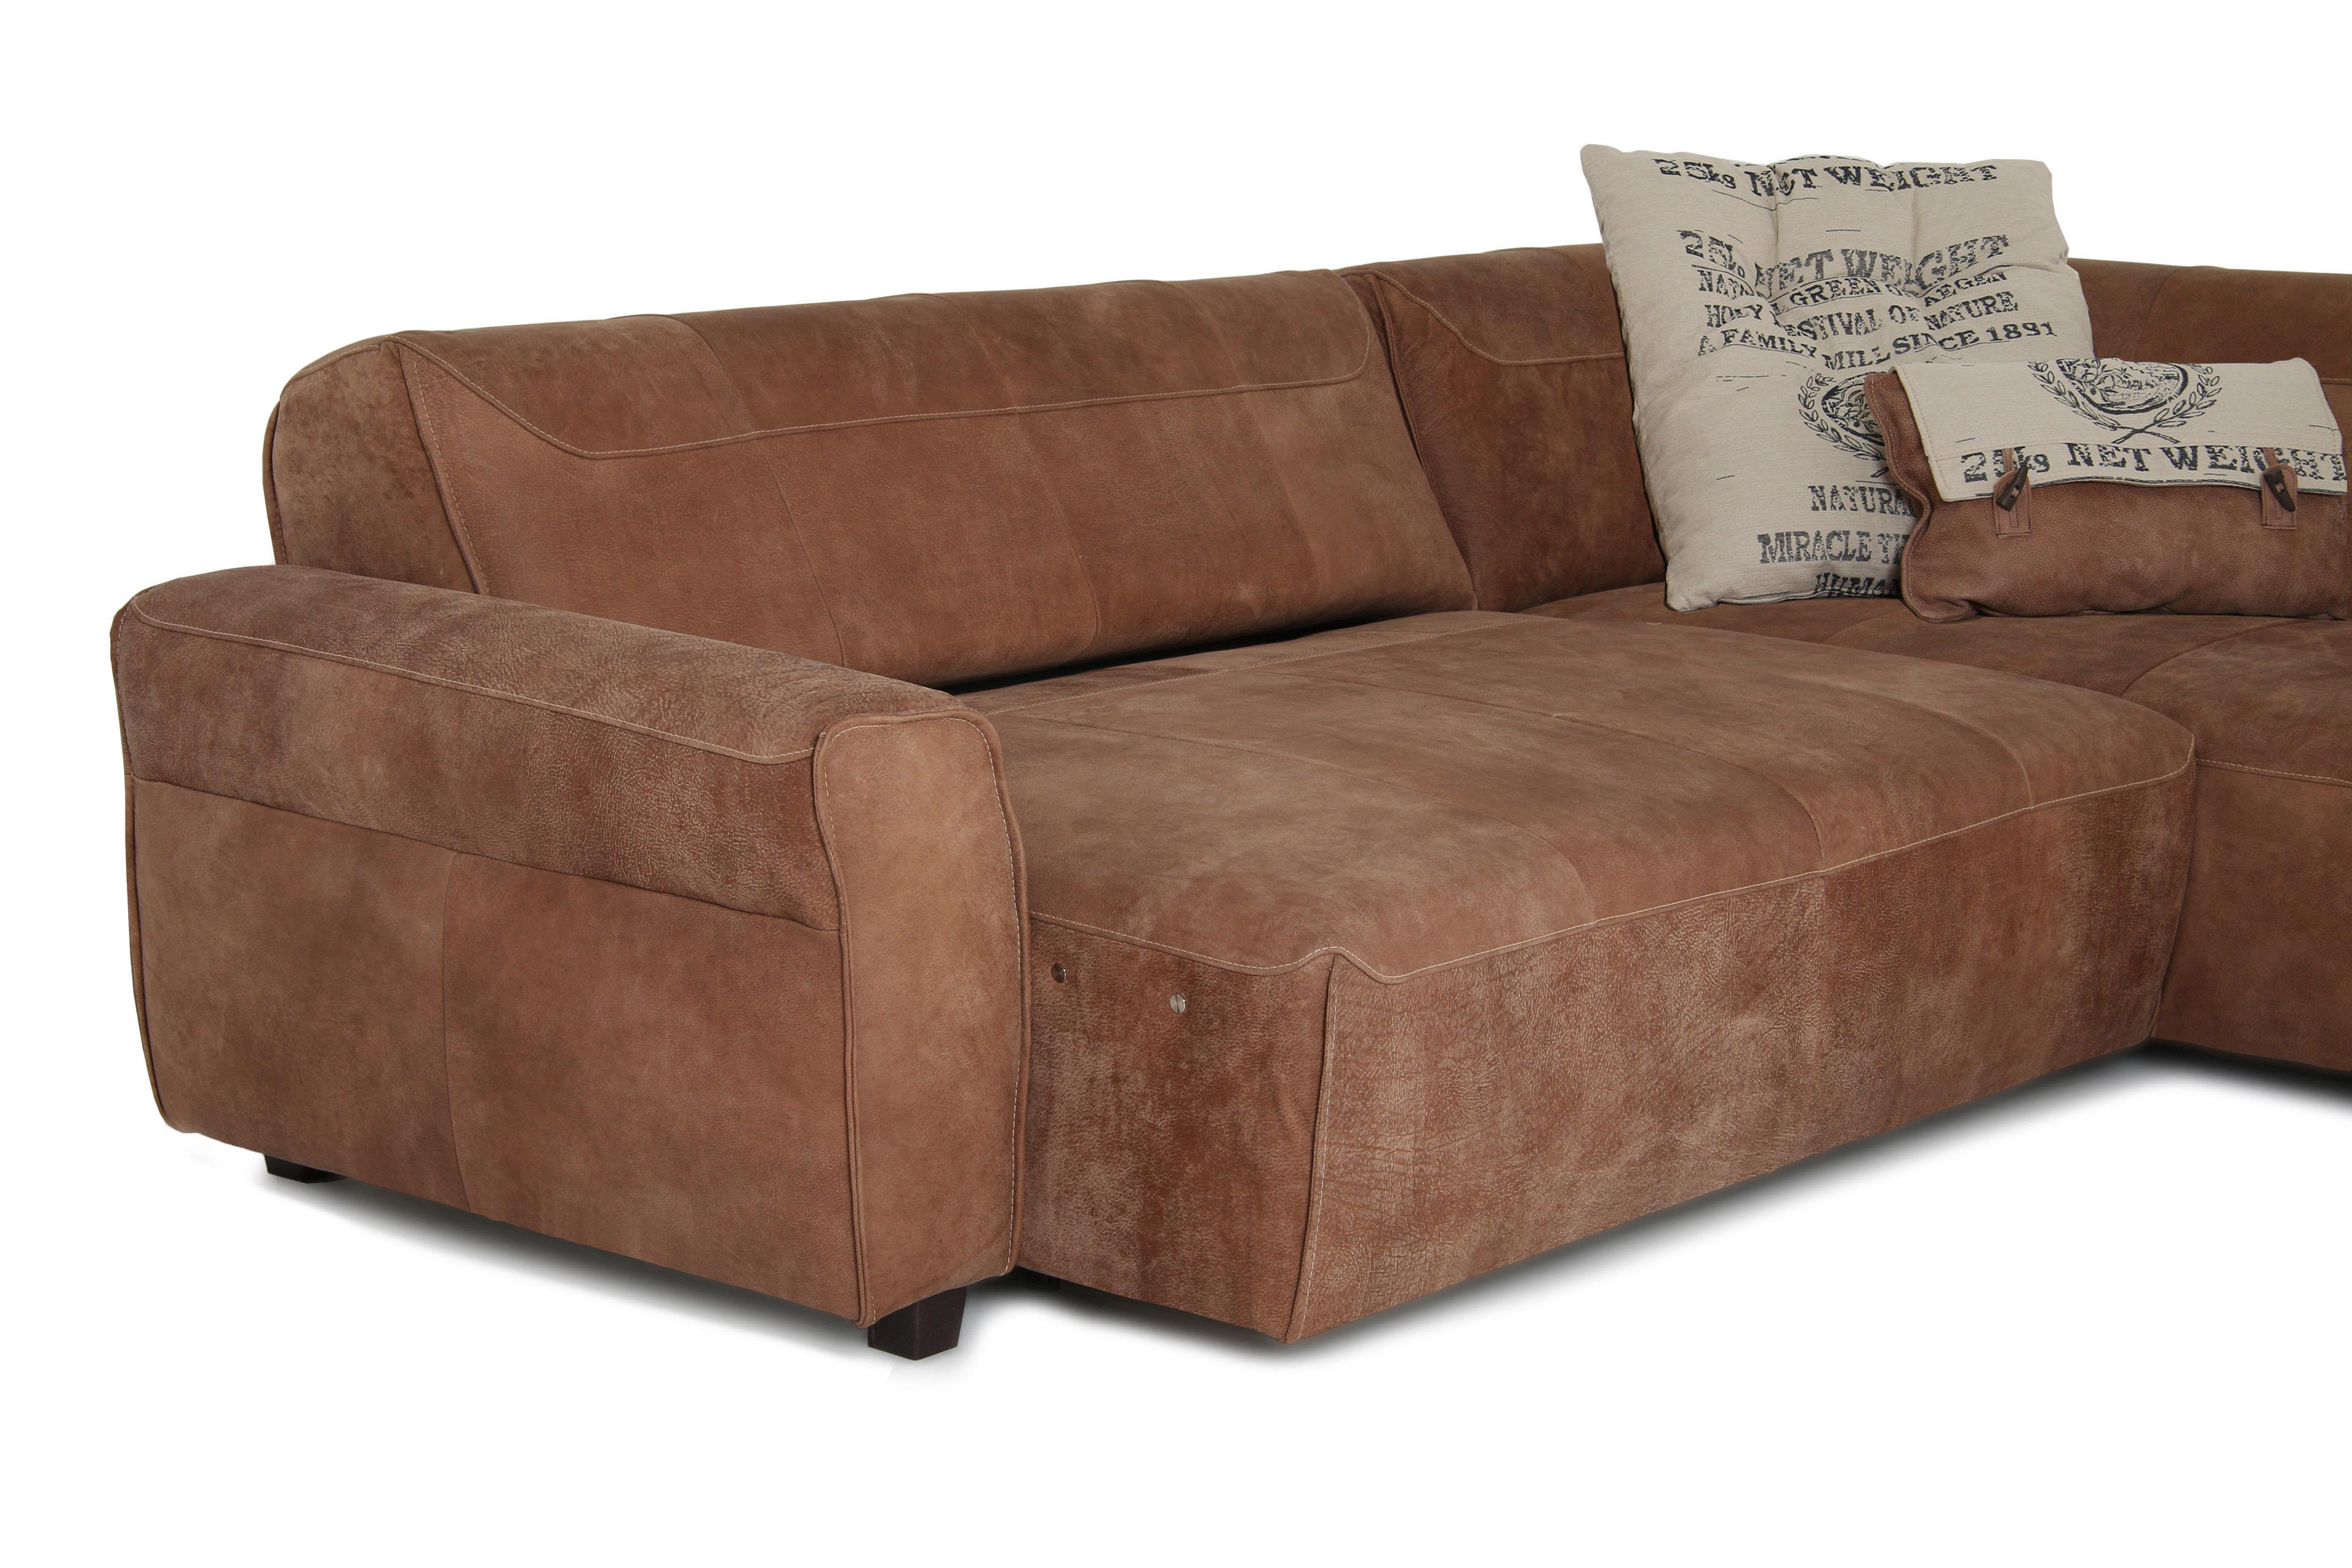 ledersofa braun sale raum und m beldesign inspiration. Black Bedroom Furniture Sets. Home Design Ideas